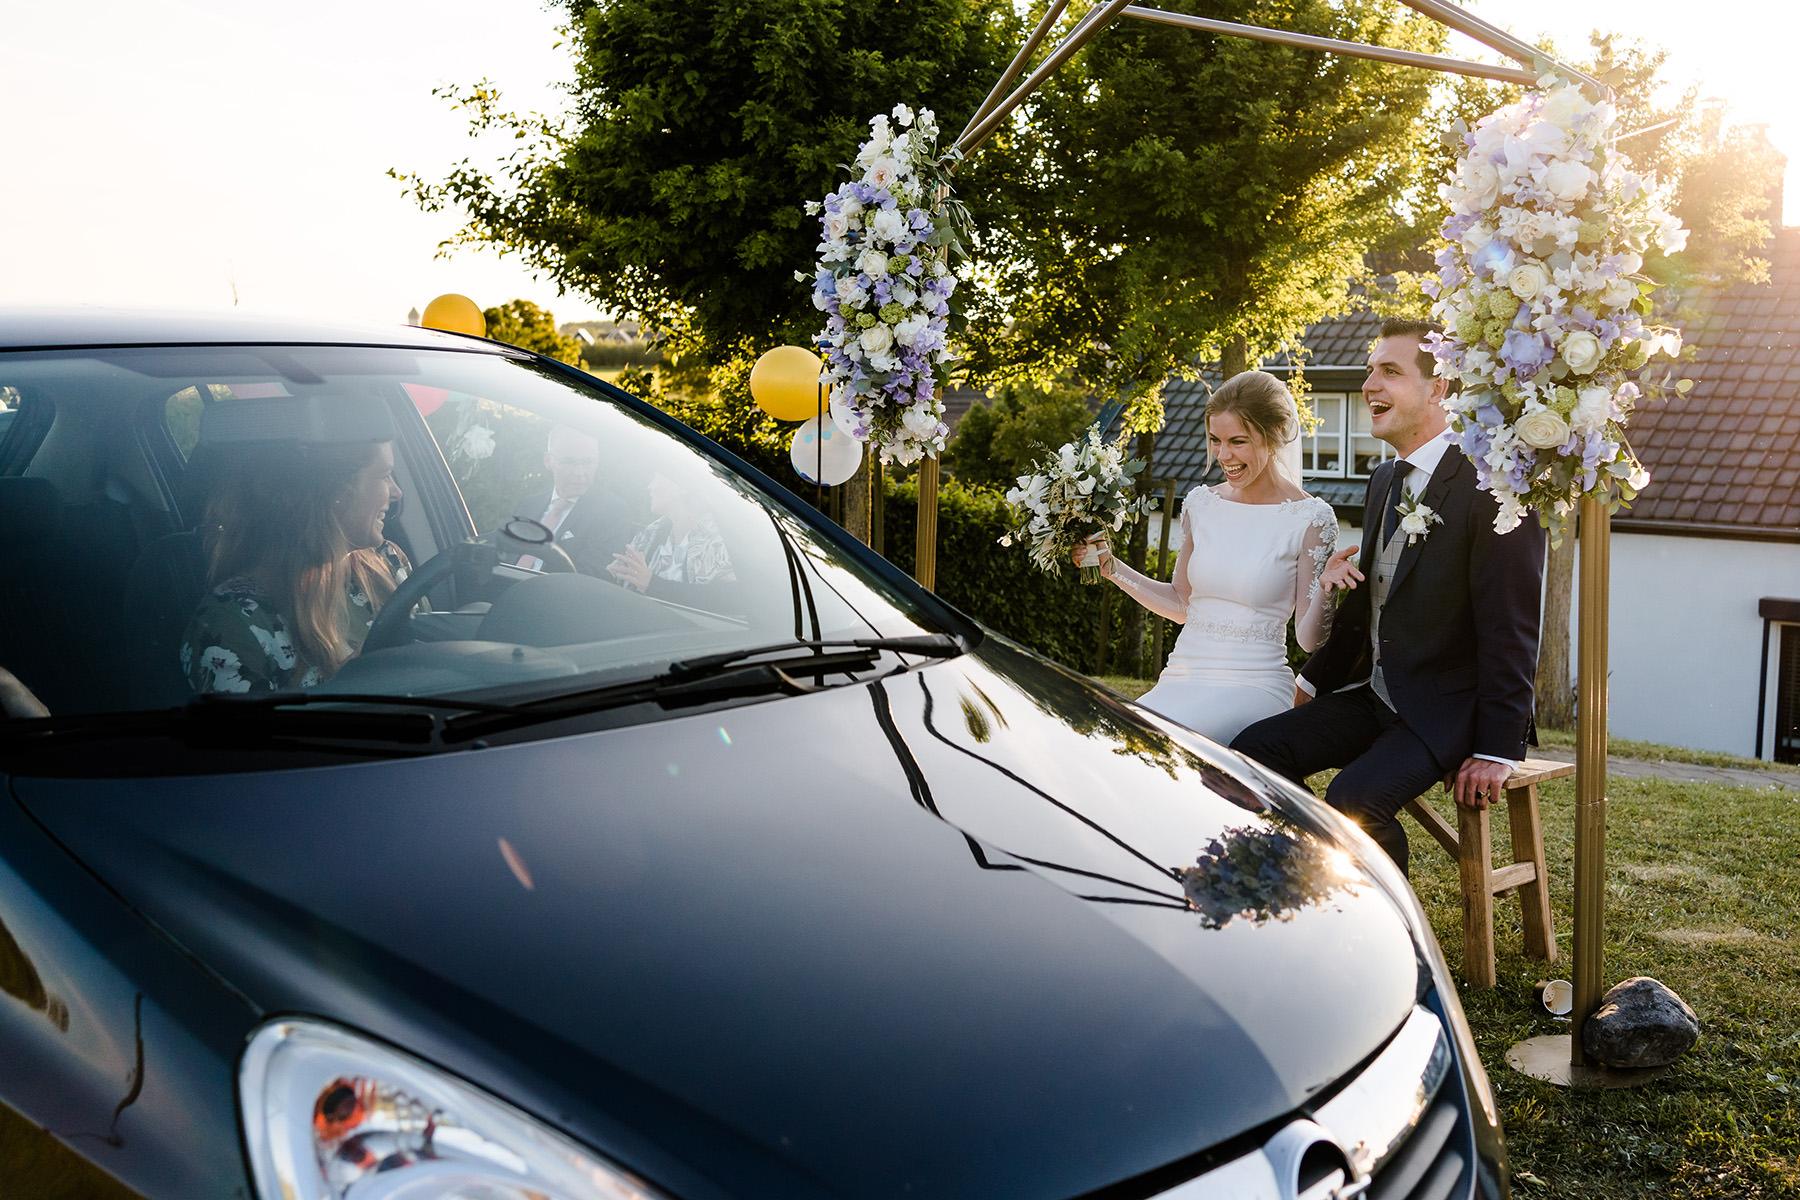 Coronabruiloft | Trouwen in coronatijd | Drive in bruiloft